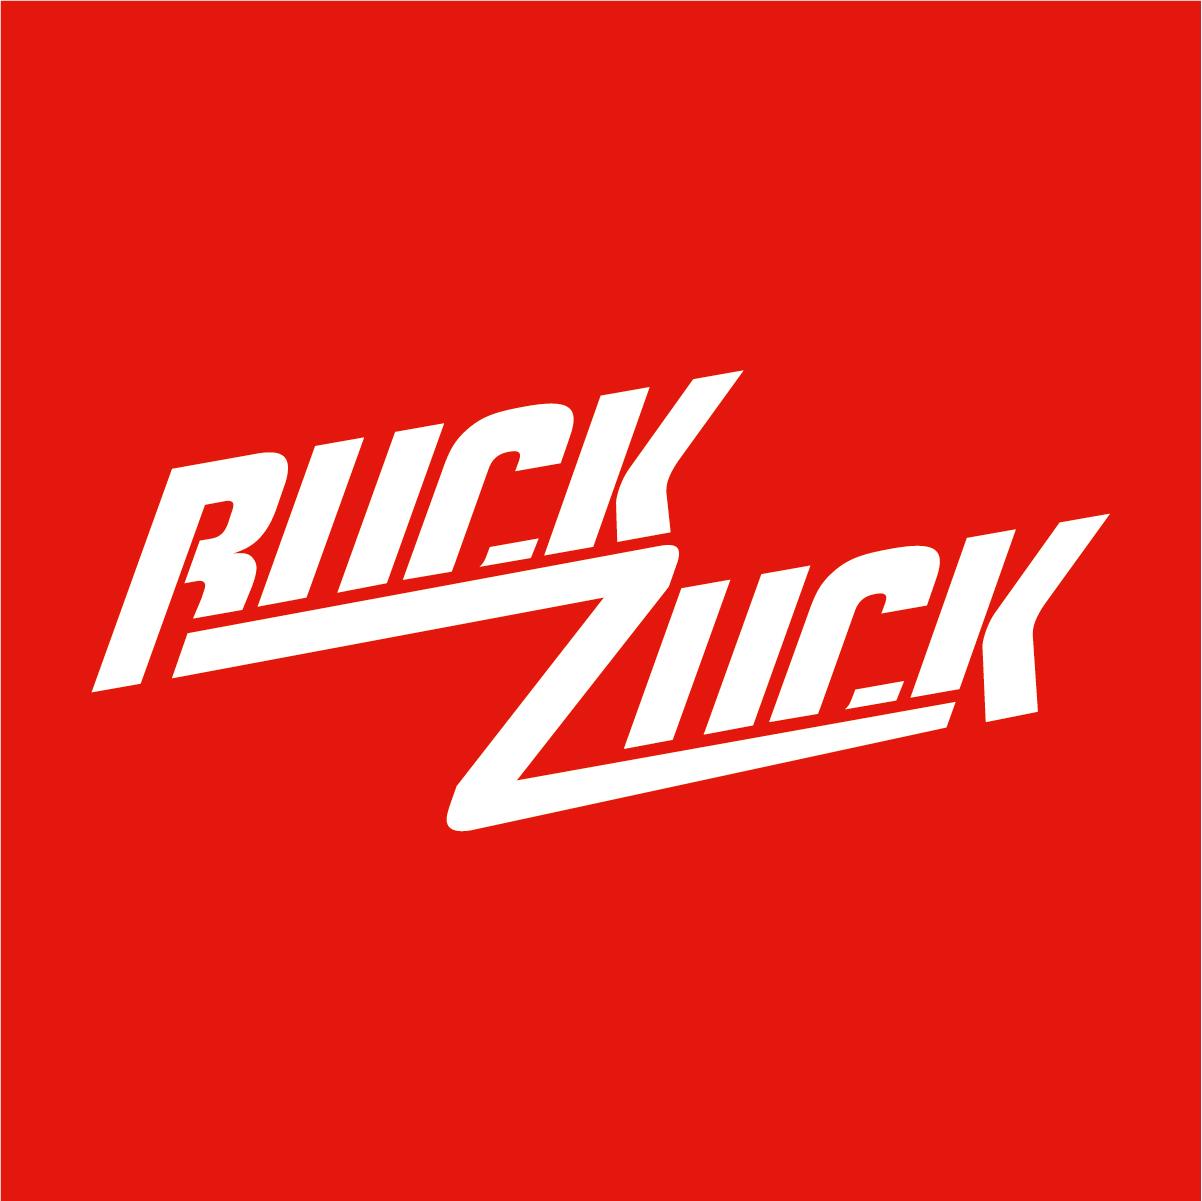 Komplettset Sono Pro Landscape Designboden 4,5mm Old Manor